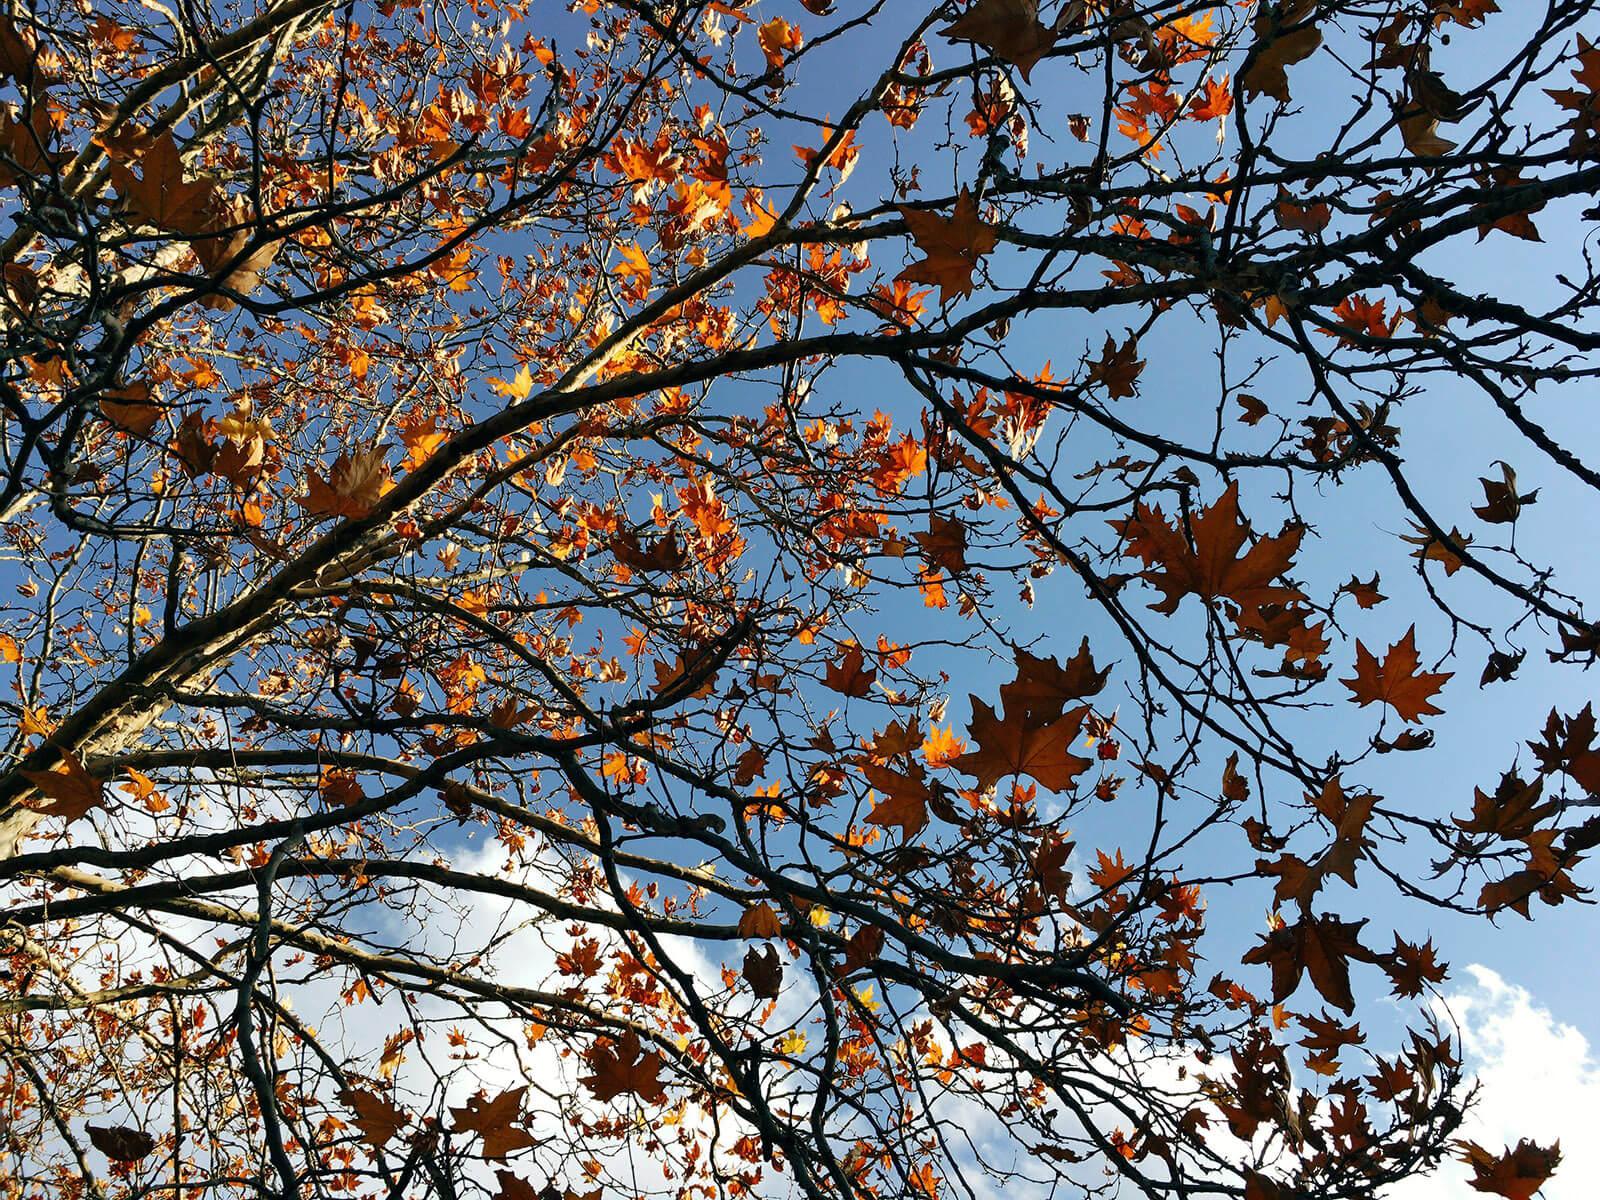 autumn leaves yellow 03